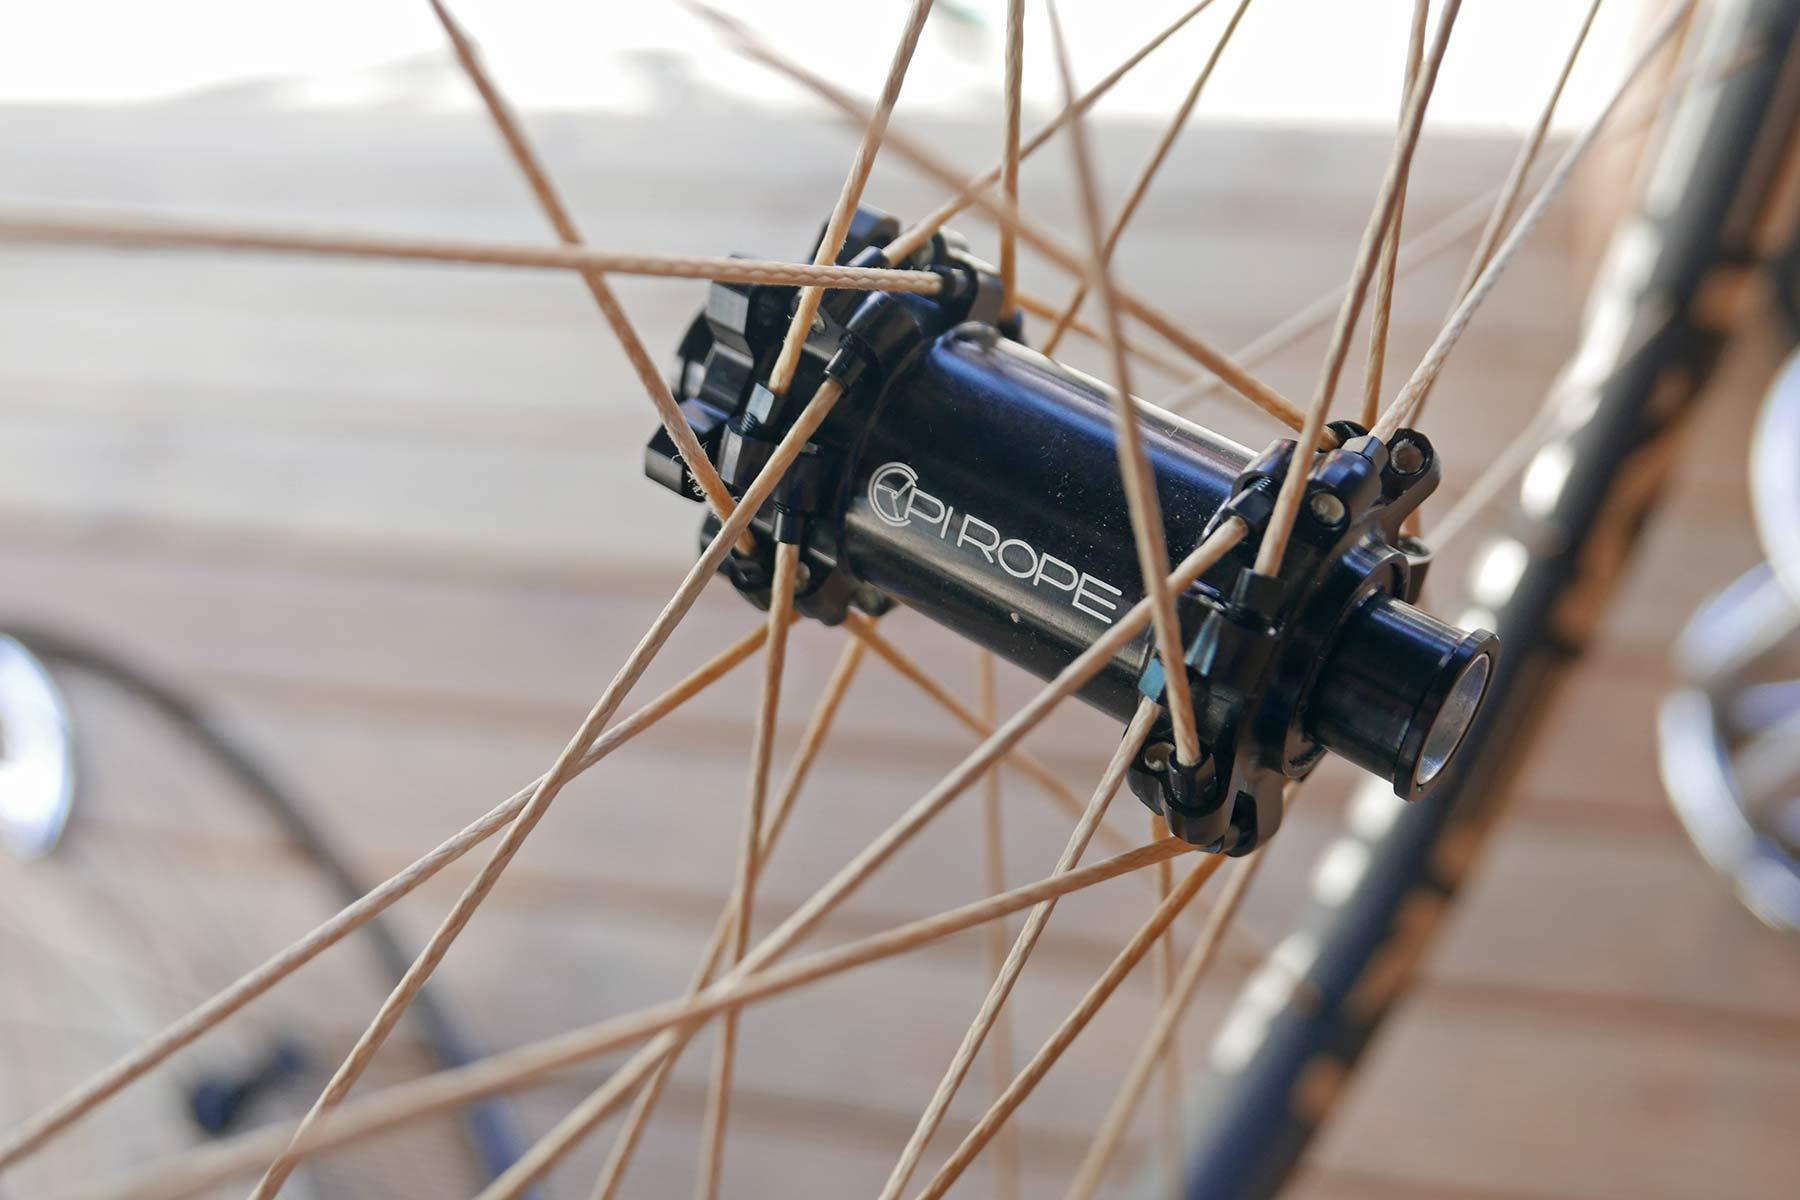 Pi Rope natural ultralight braided Vectran fiber spoke wheels